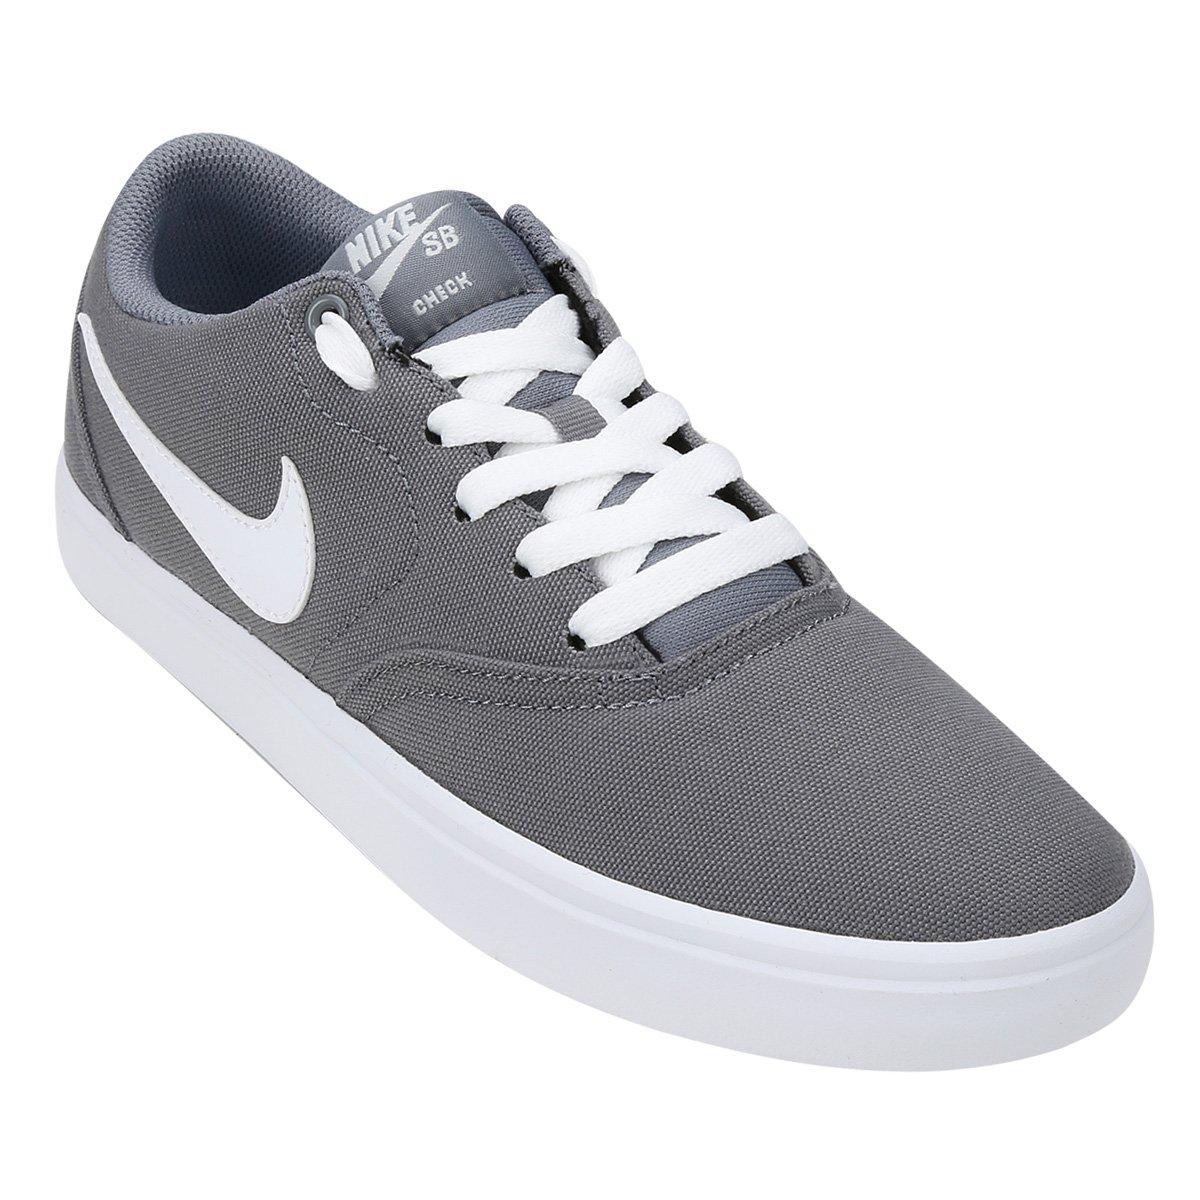 be55fda37e8 Tênis Nike Wmns Sb Check Solar Cnvs Feminino - Cinza e Branco - Compre  Agora